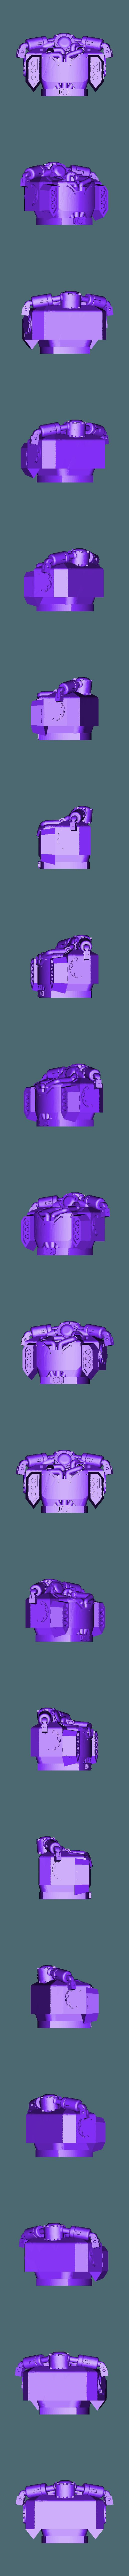 Torso.stl Download free STL file New parts for the mark II Centurion • 3D printer object, GarinC3D